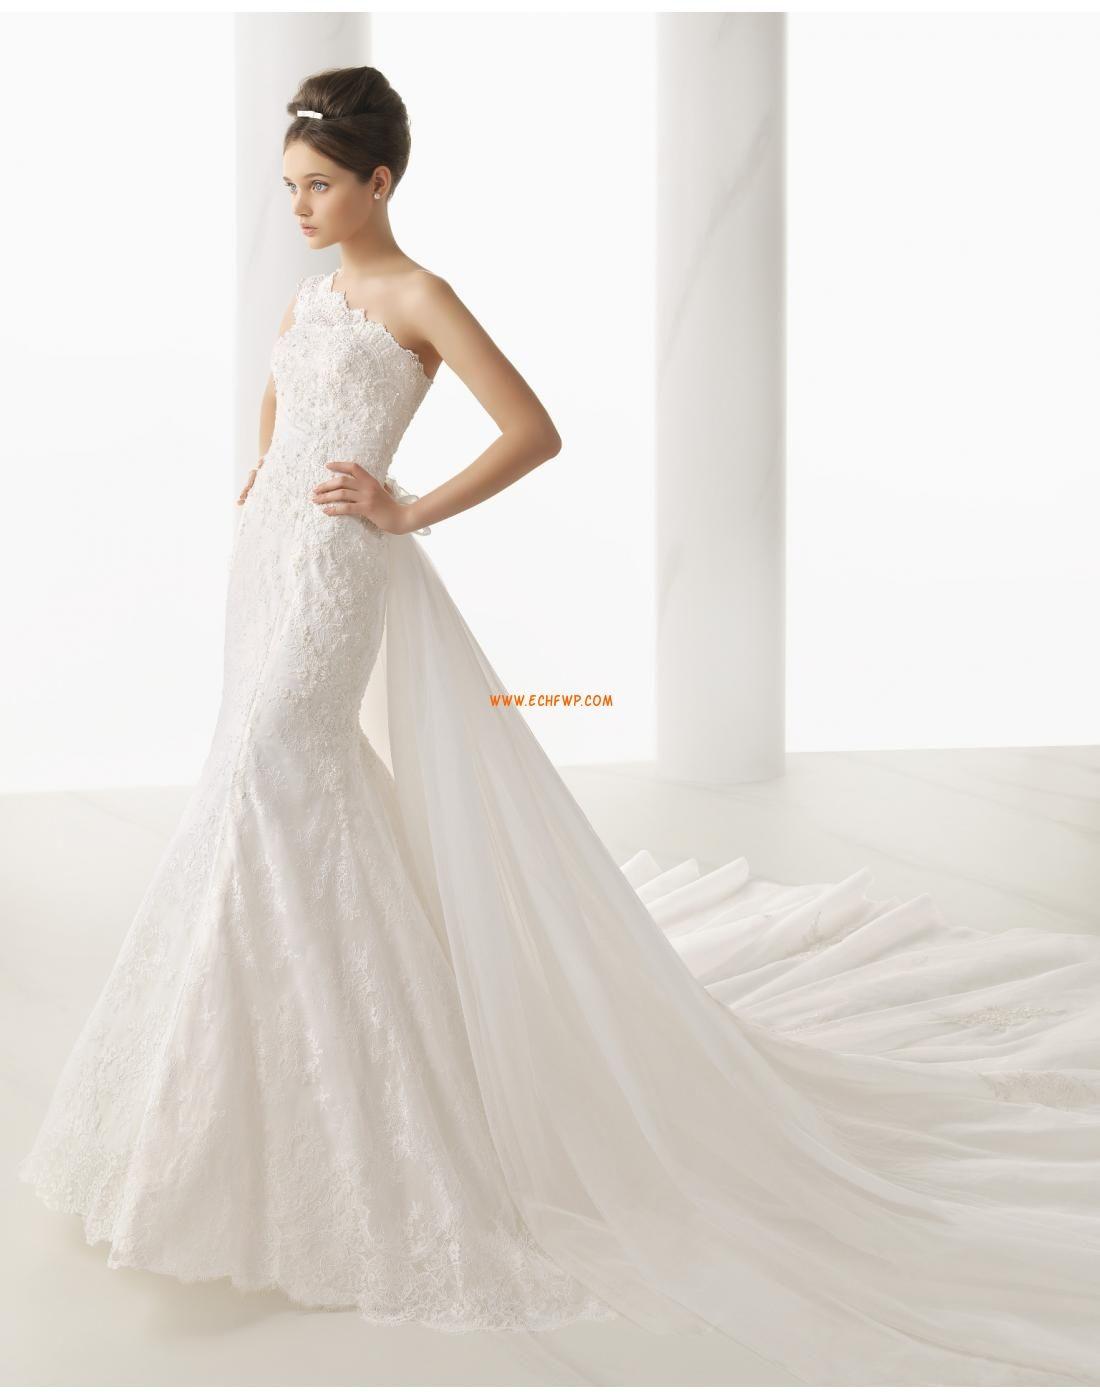 Meerjungfrau-Linie/Mermaid-Stil Spitzen-Looks 3/4 Arm Brautkleider ...